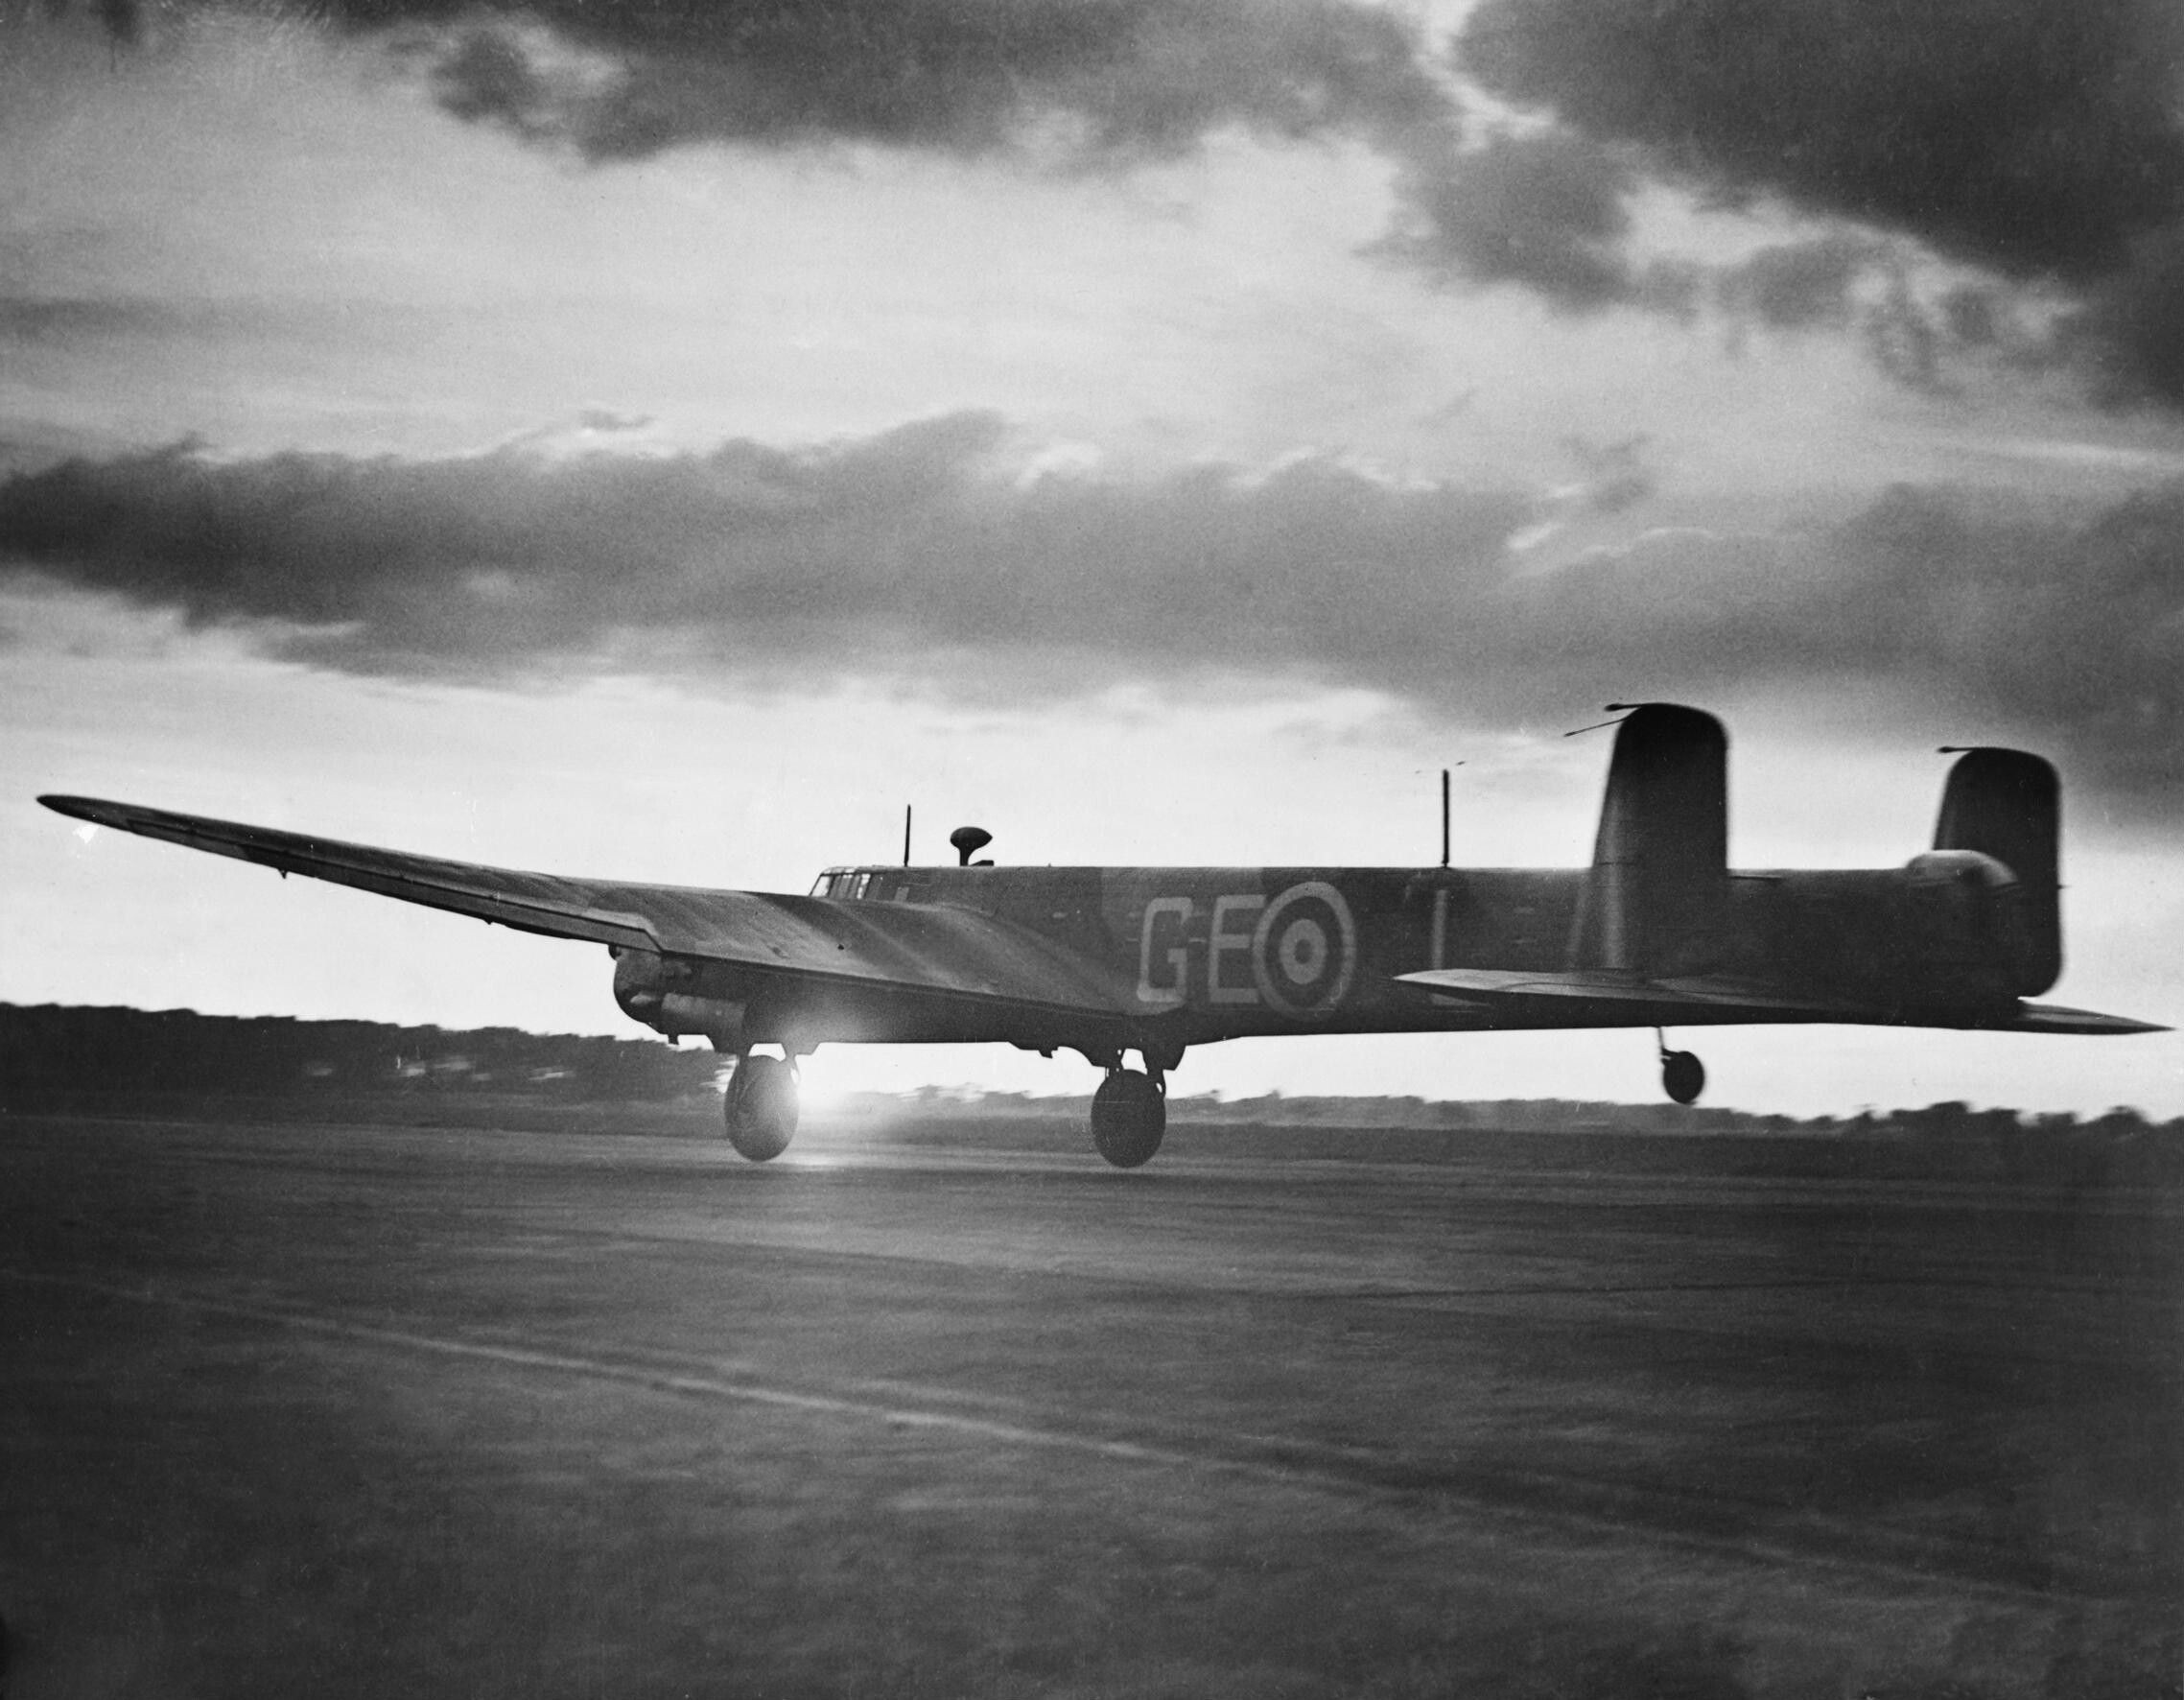 No. 251 Squadron RAF